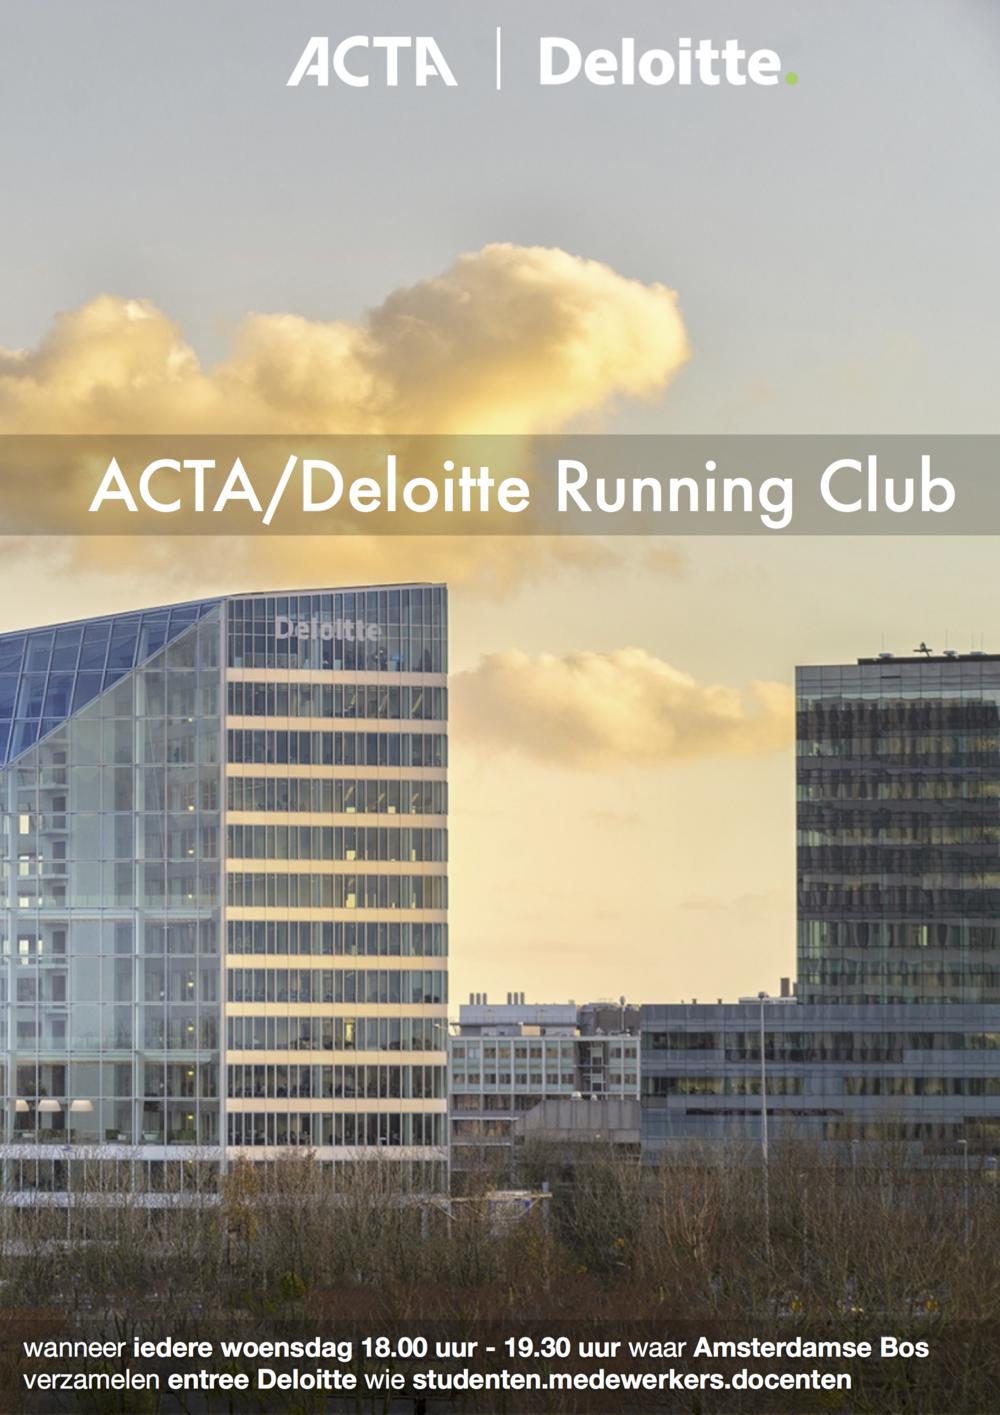 initiator acta/deloitte running club 2017